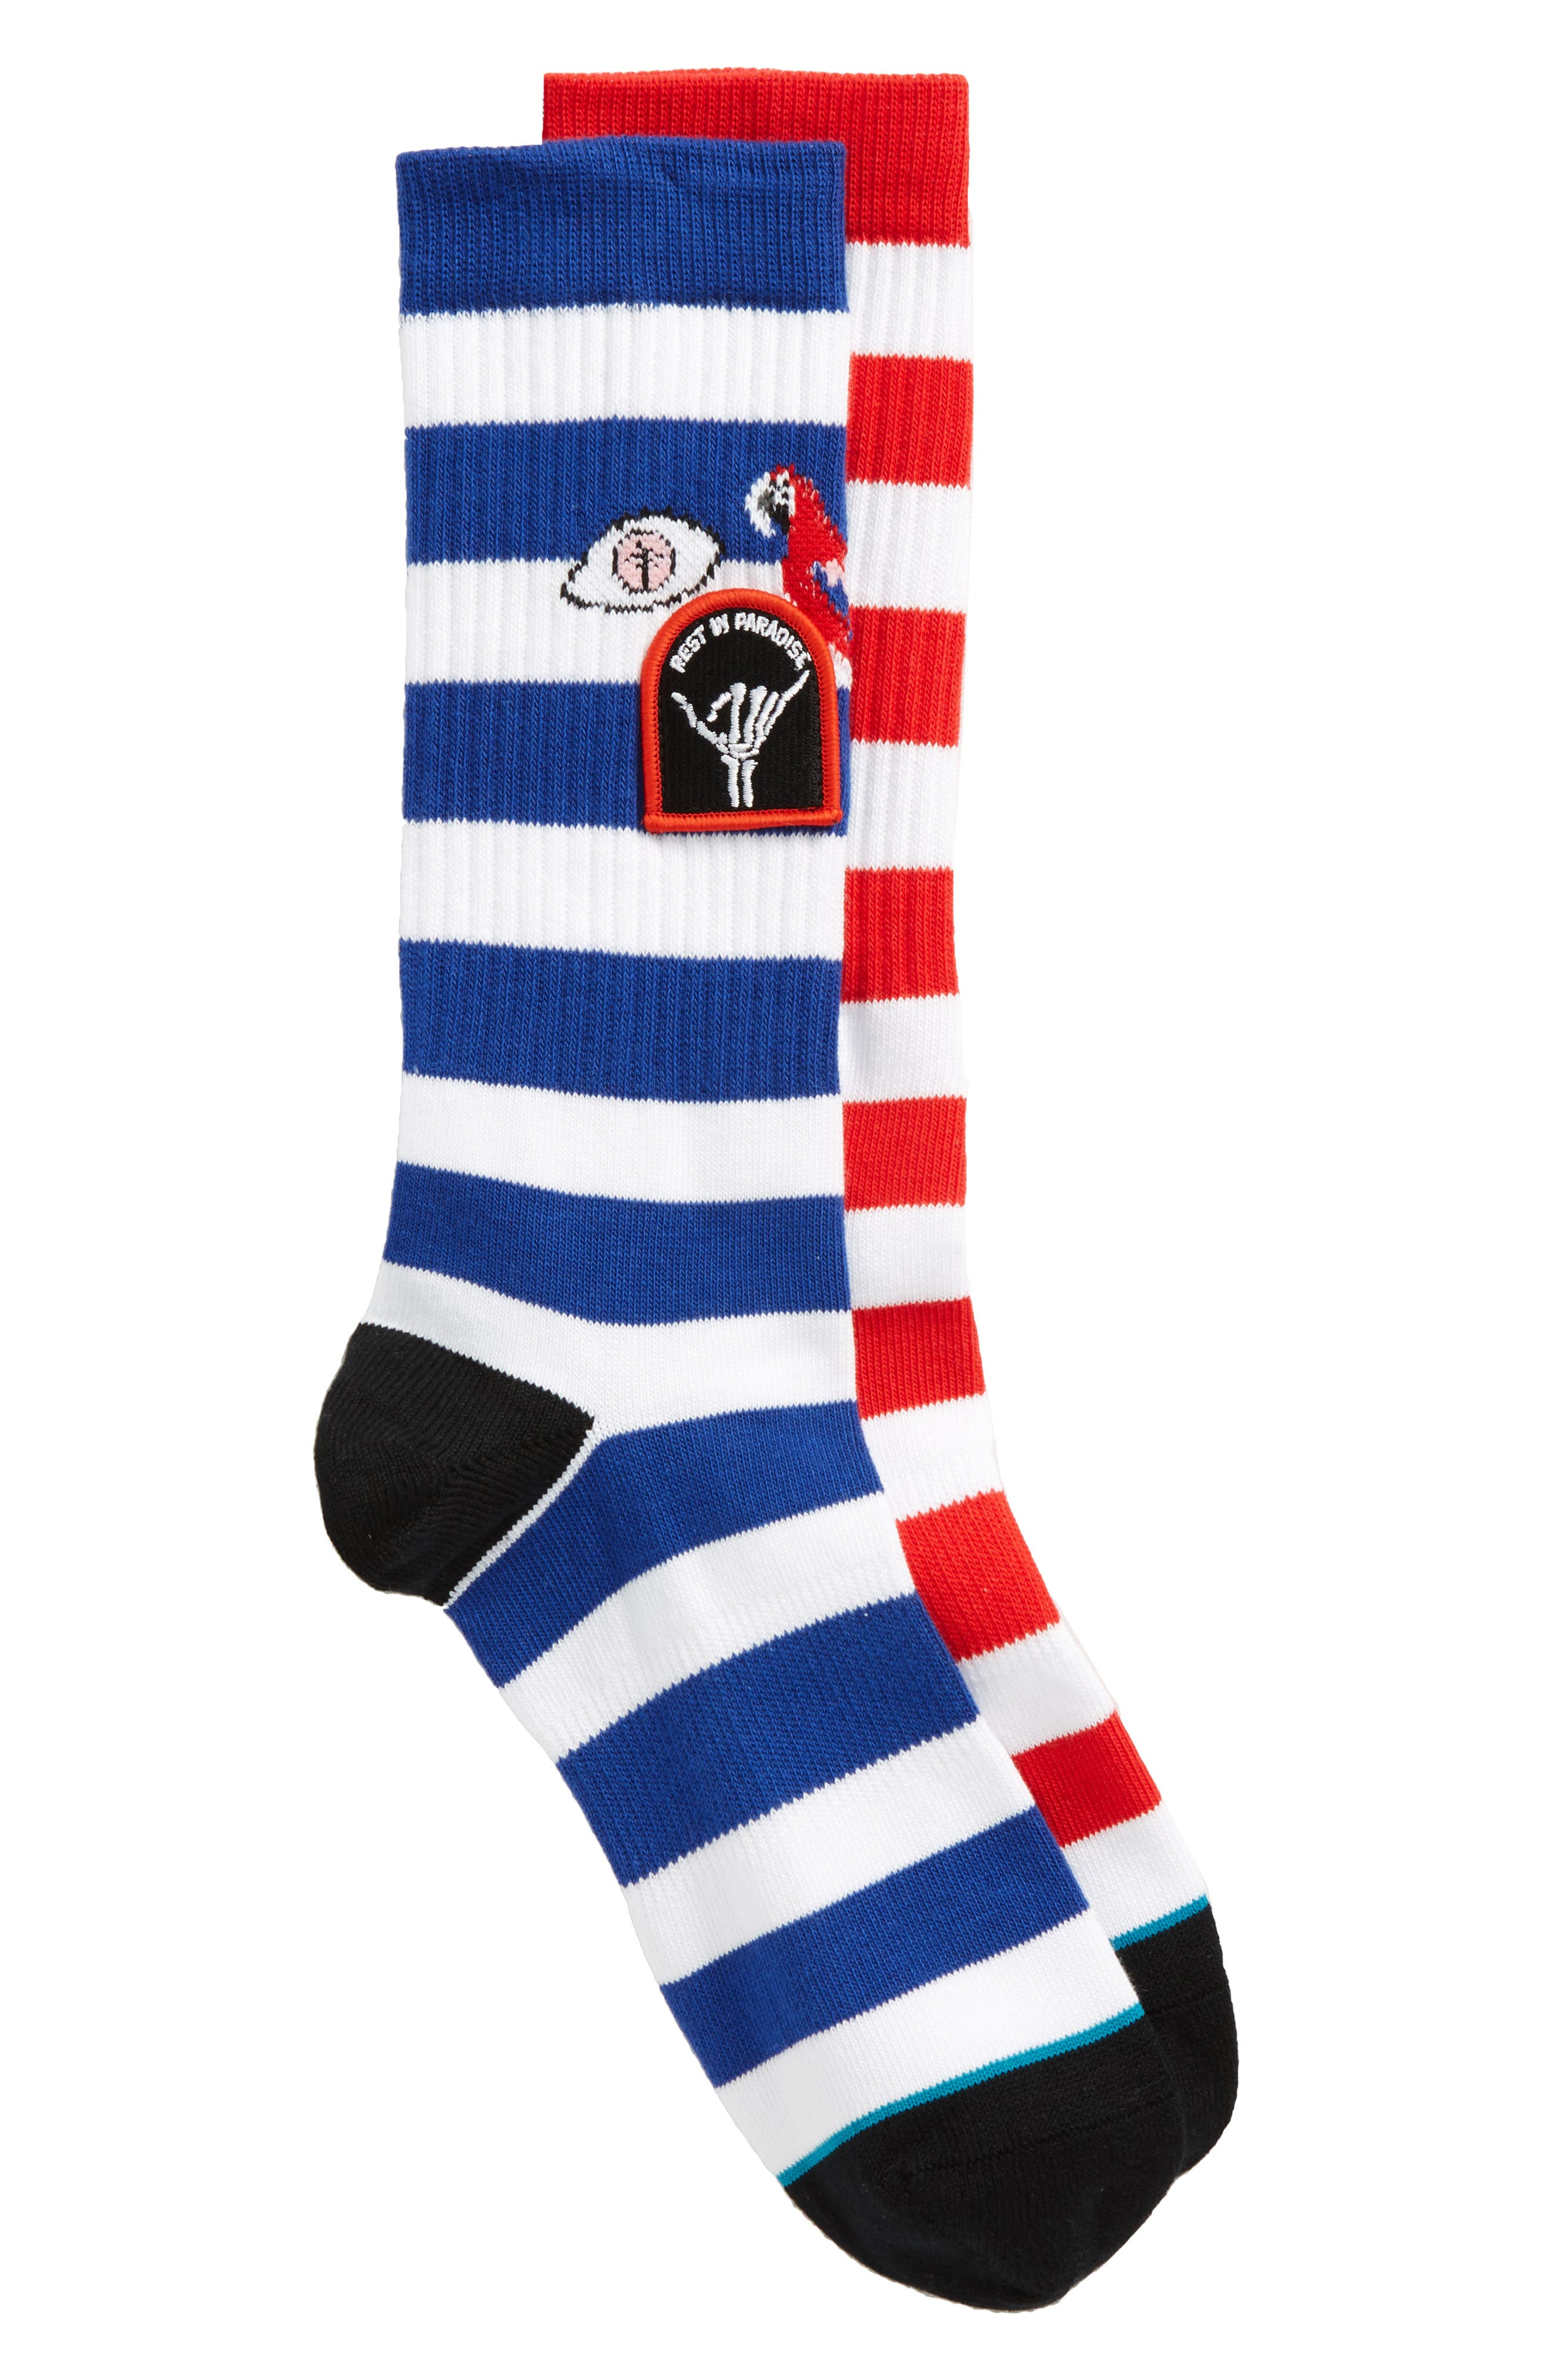 Staycation Stripe Socks,                         Main,                         color, Blue